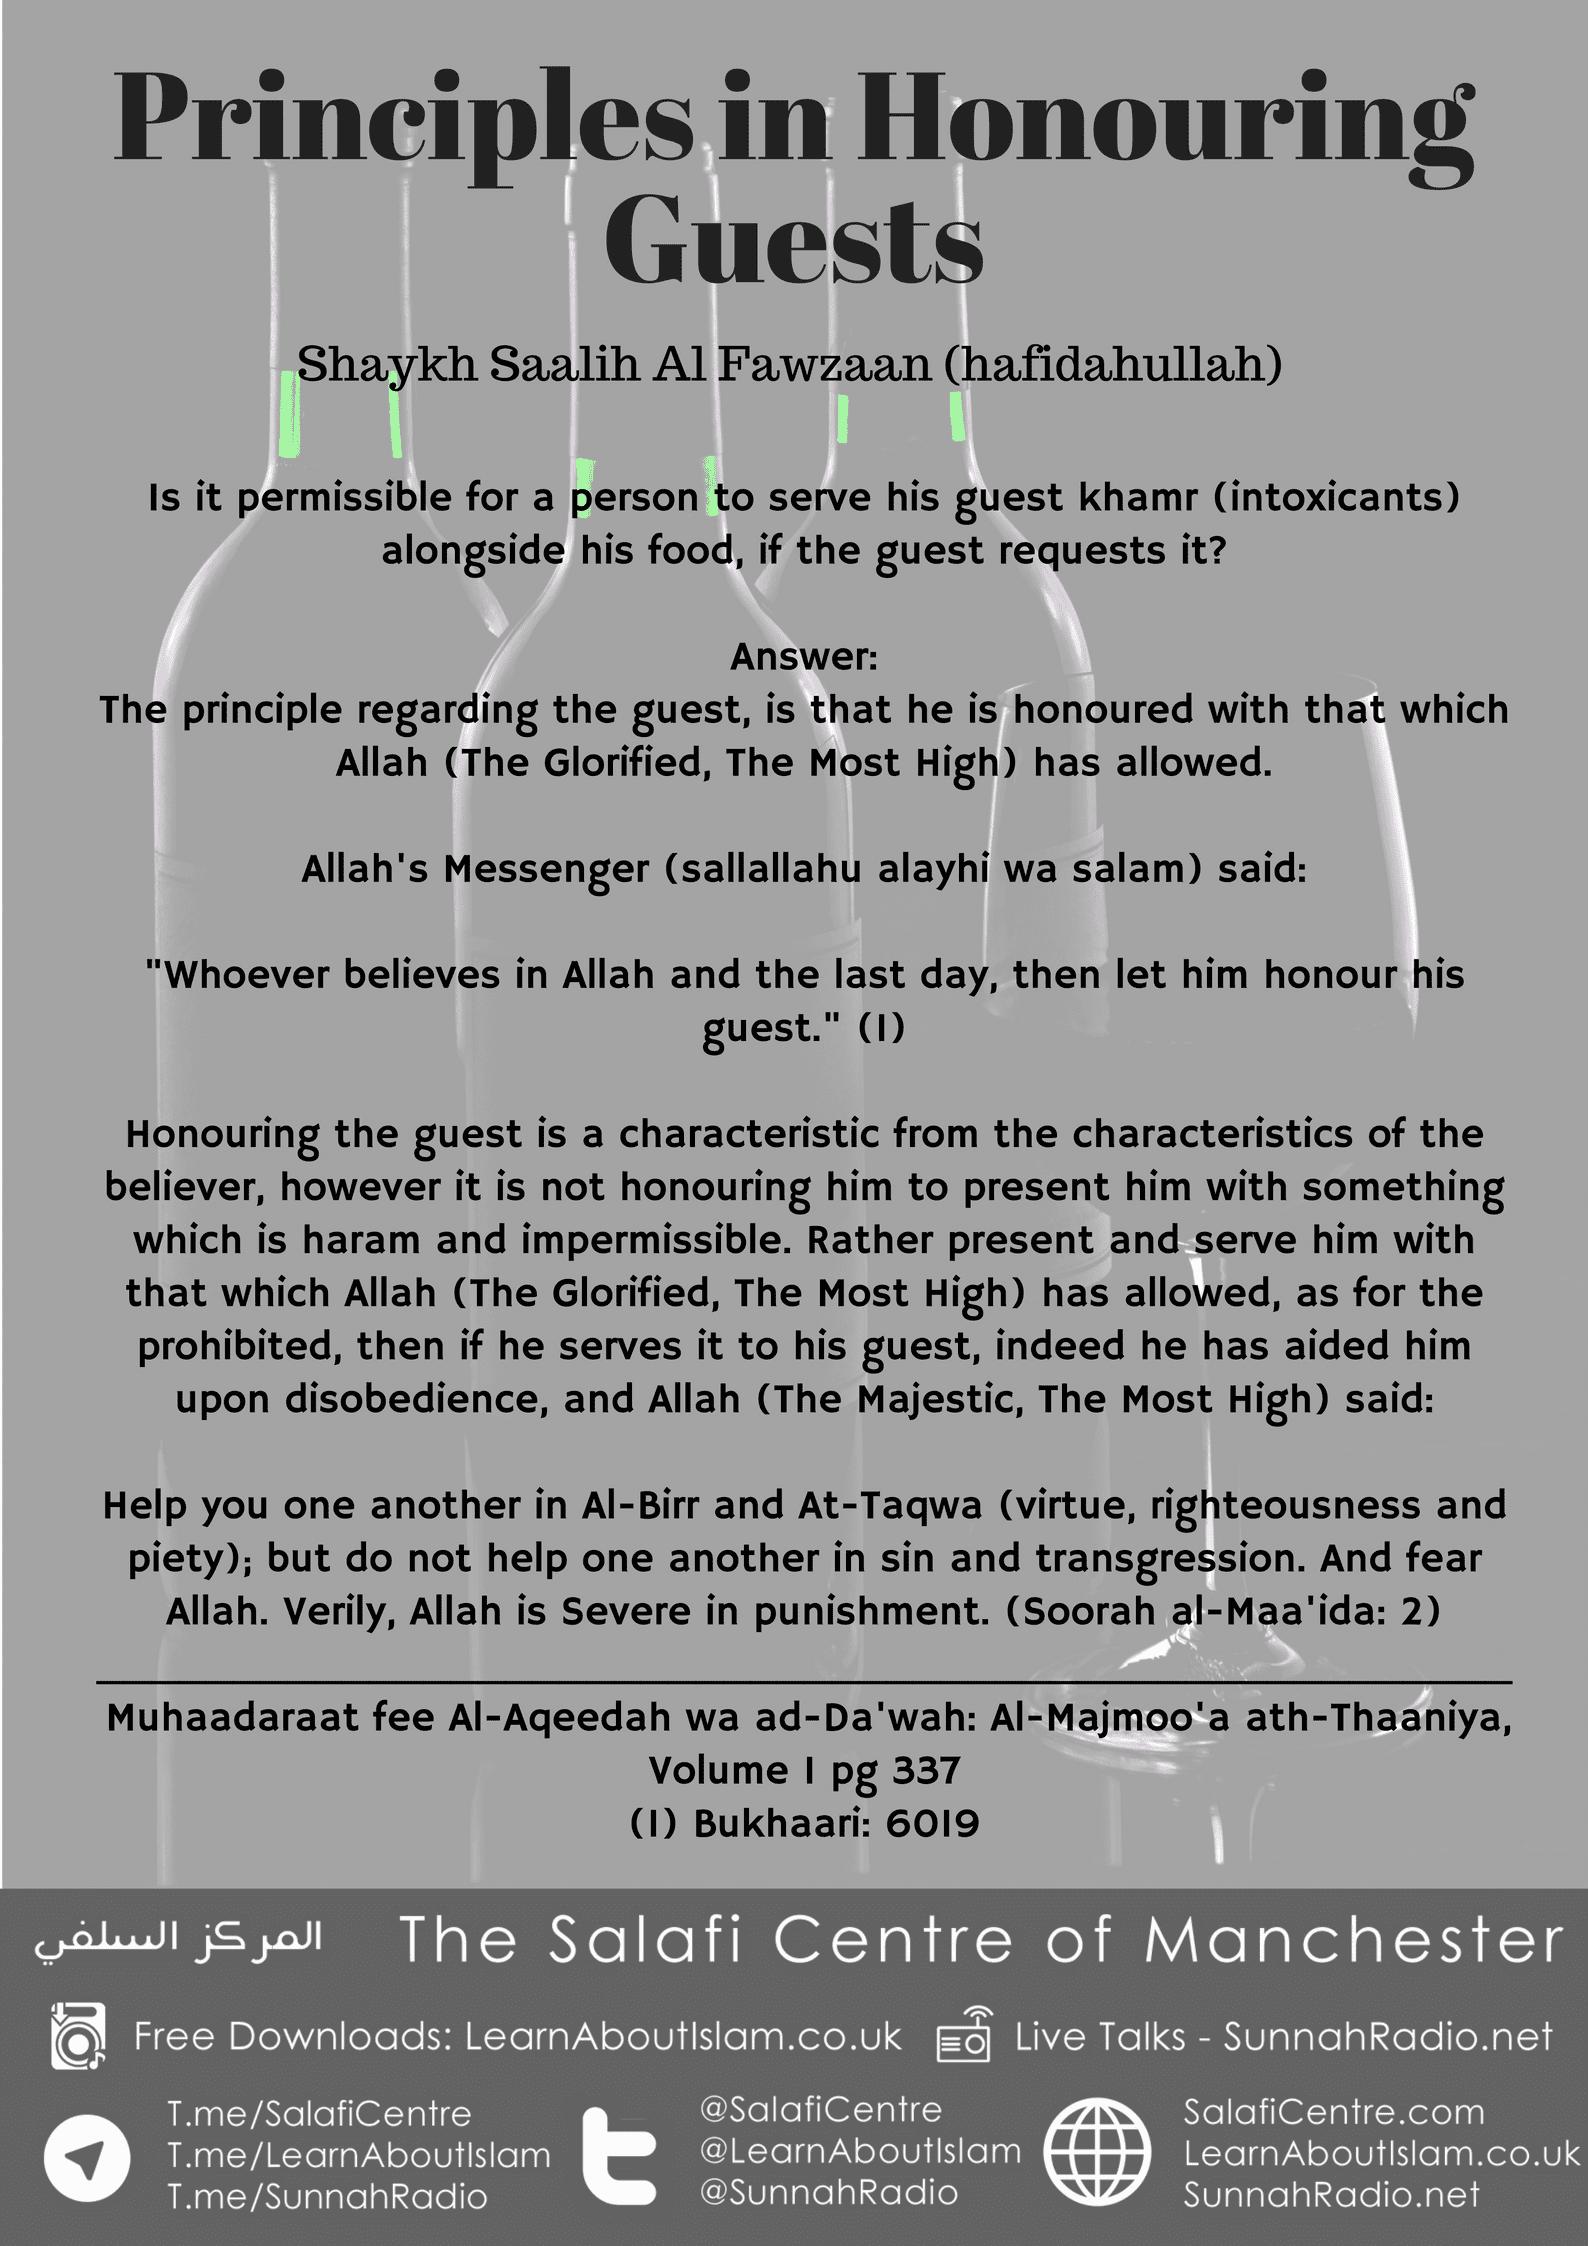 Principles in Honouring Guests – Shaykh Saalih al-Fawzaan